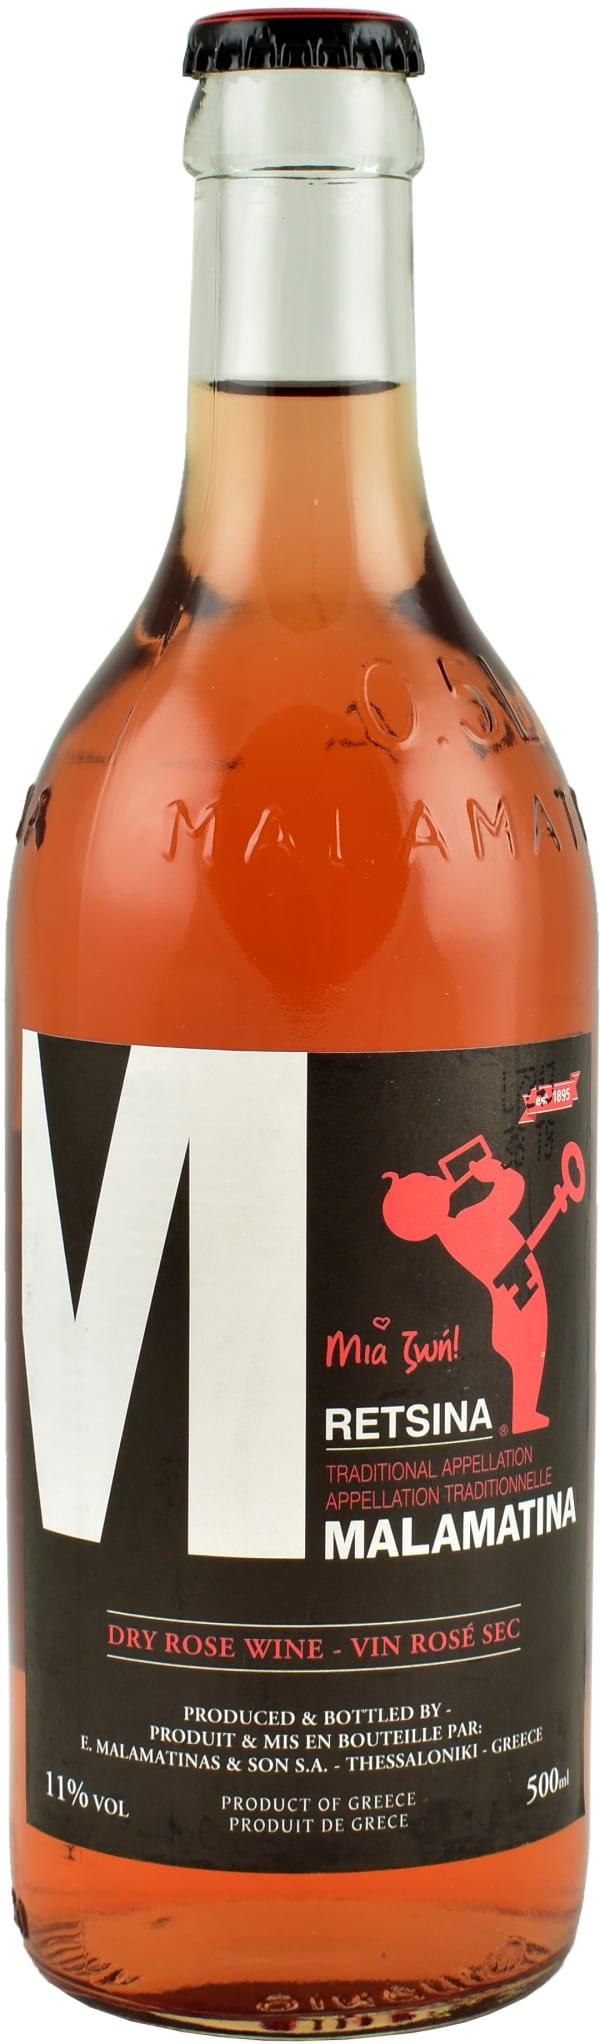 Malamatina Retsina Dry Rose